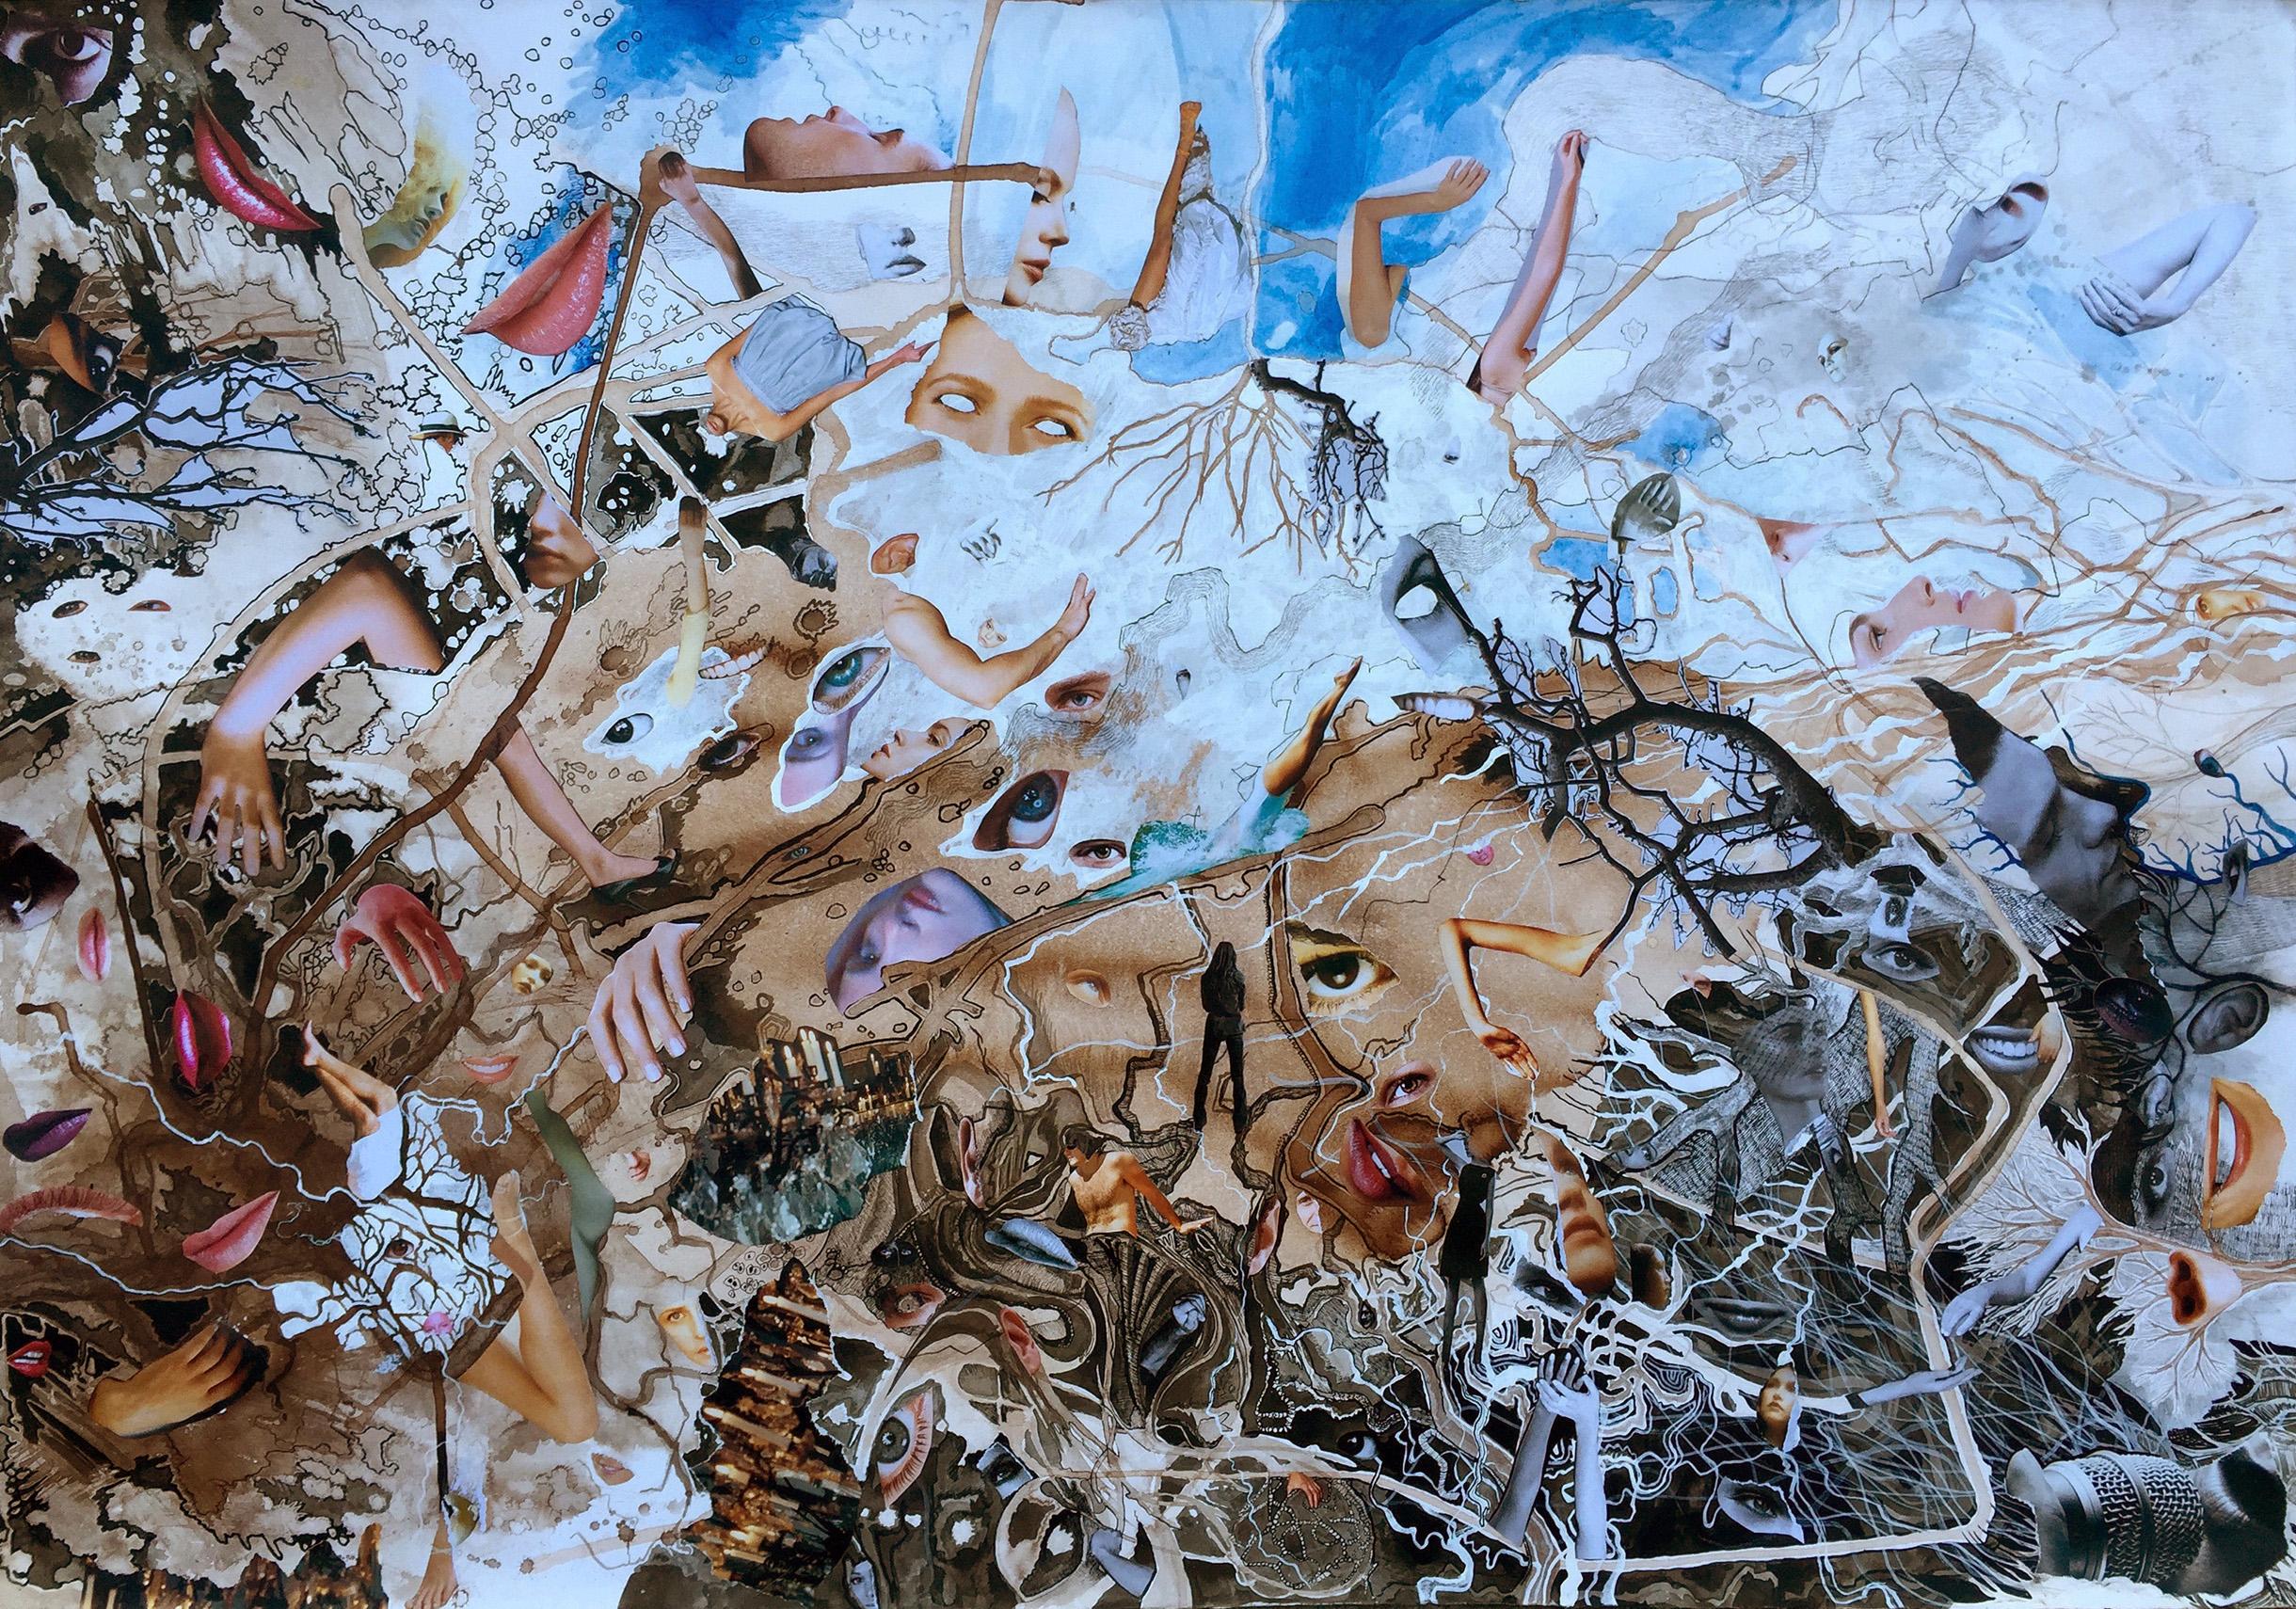 Sue Dodd, The Last Tour I , ink, graphite, gouache, acrylic, magazine prints, 100 x 69.5cm